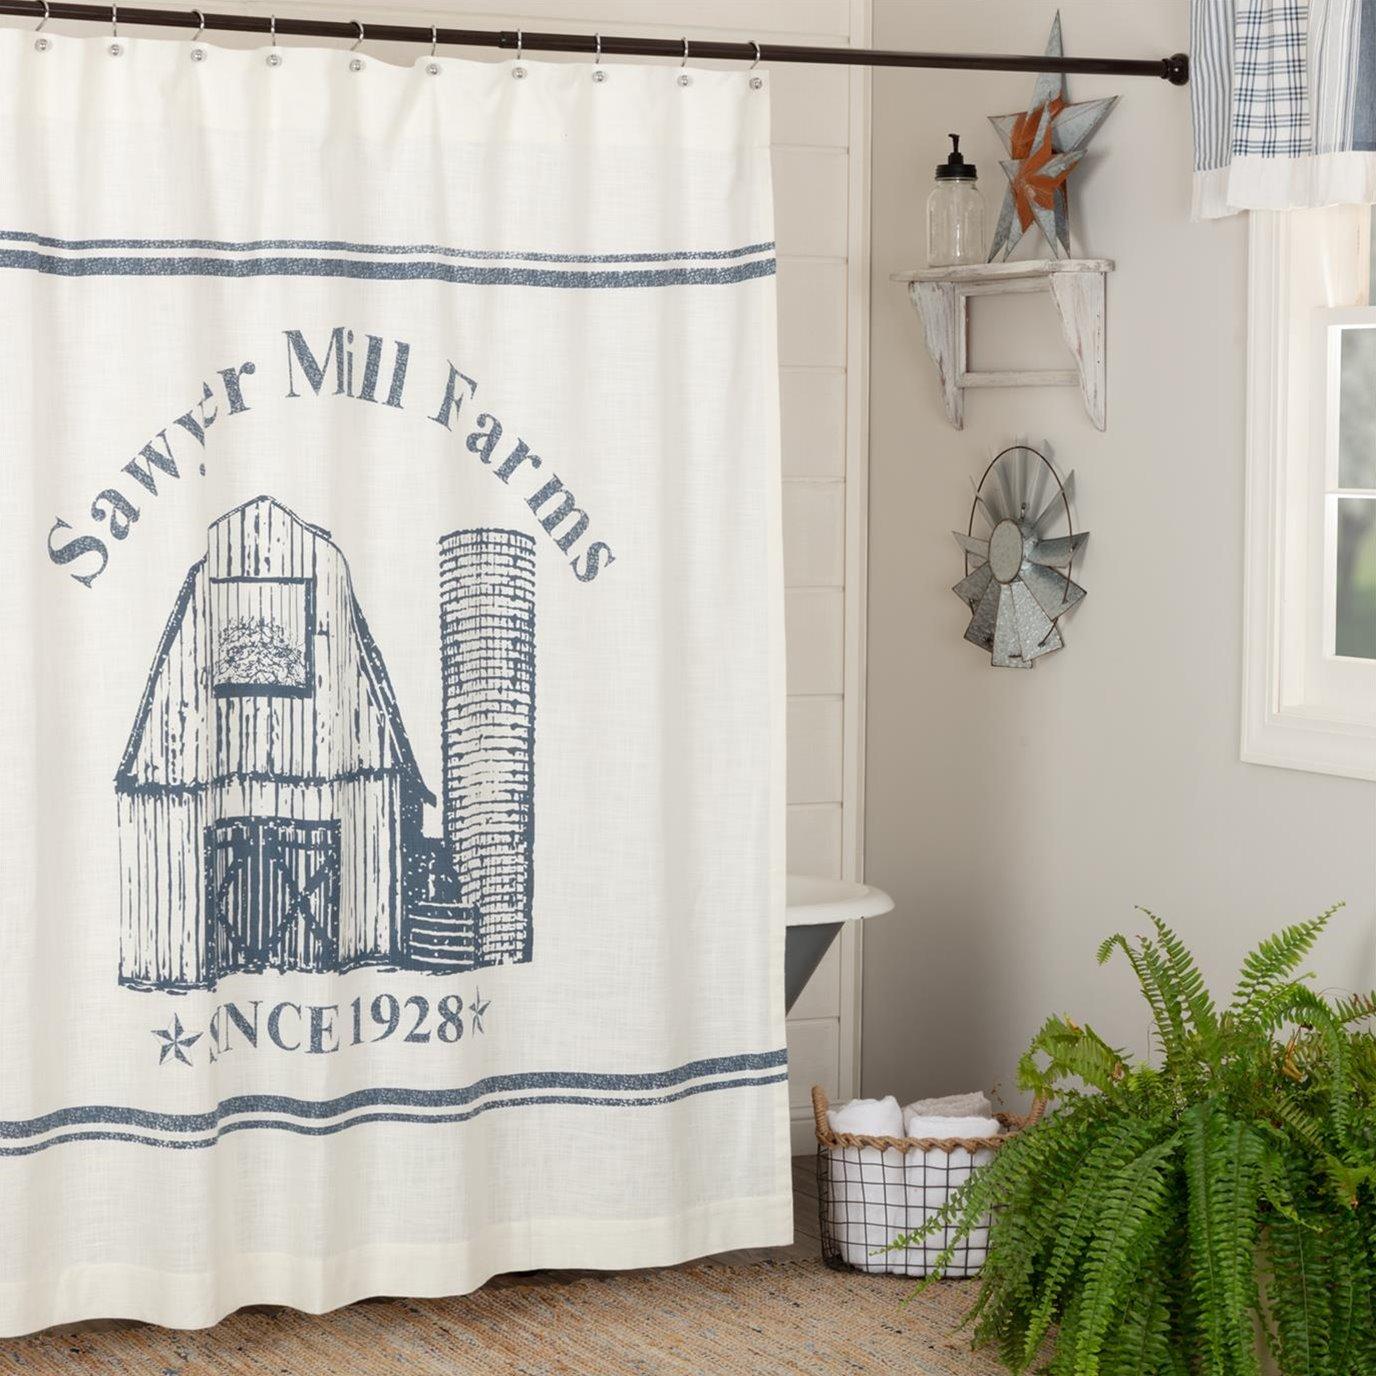 Sawyer Mill Blue Barn Shower Curtain 72x72